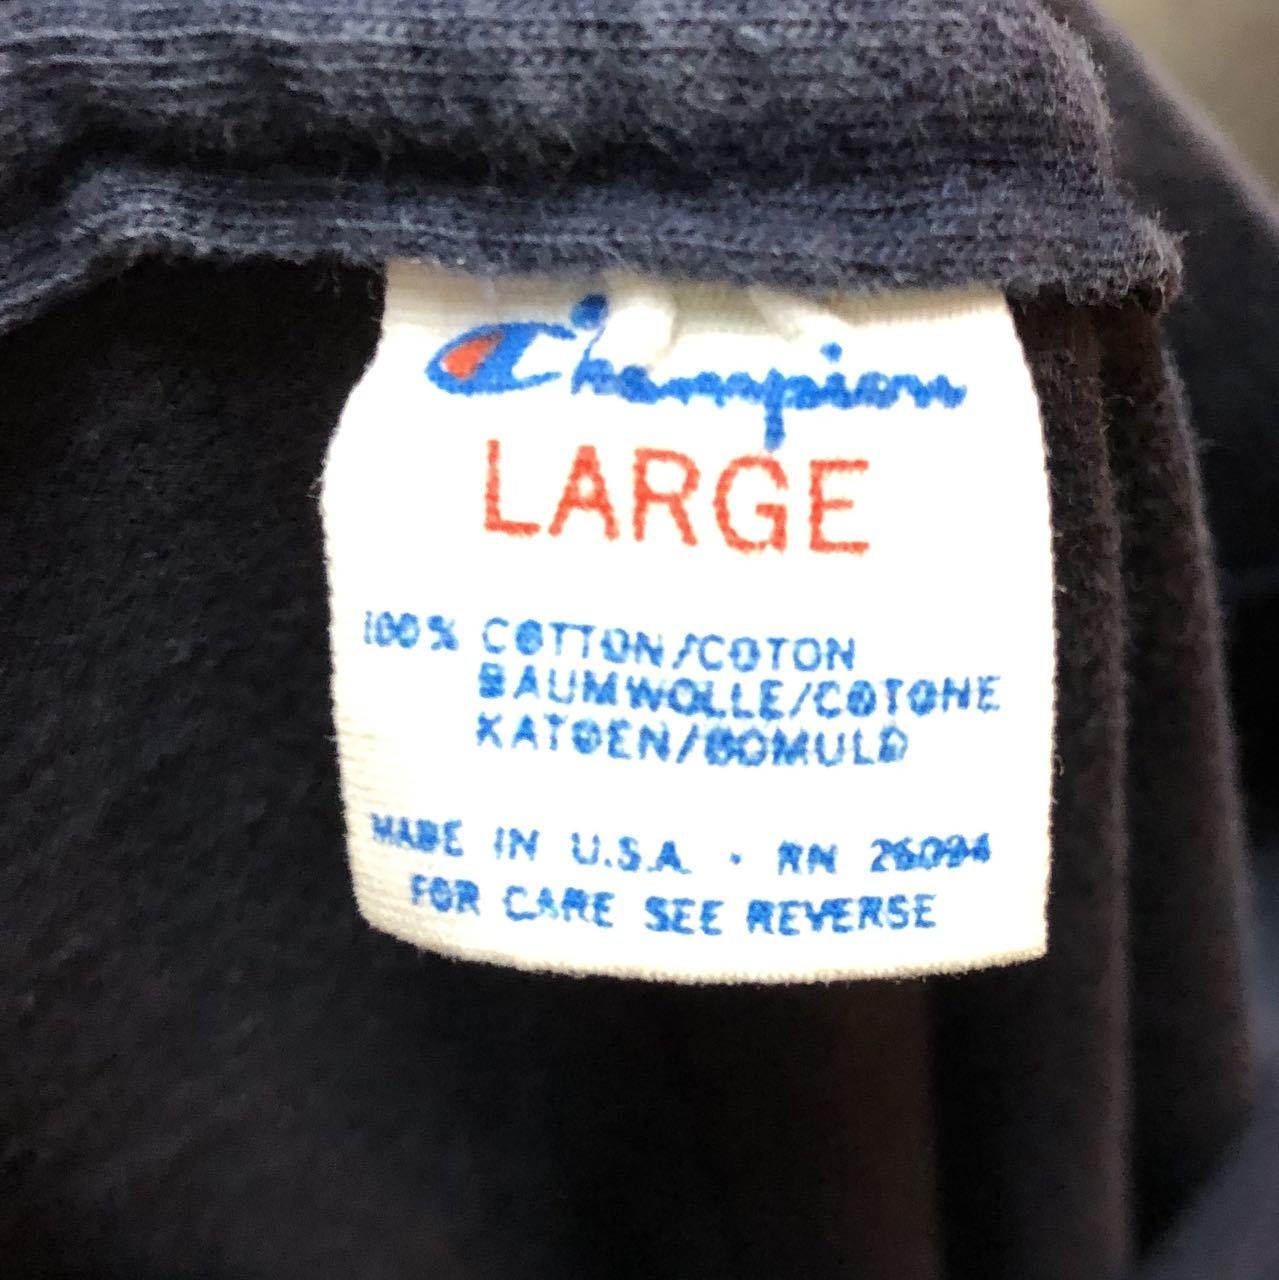 80s all cotton チャンピオン トリコタグ 数式プリント Tシャツ! _c0144020_19322715.jpg